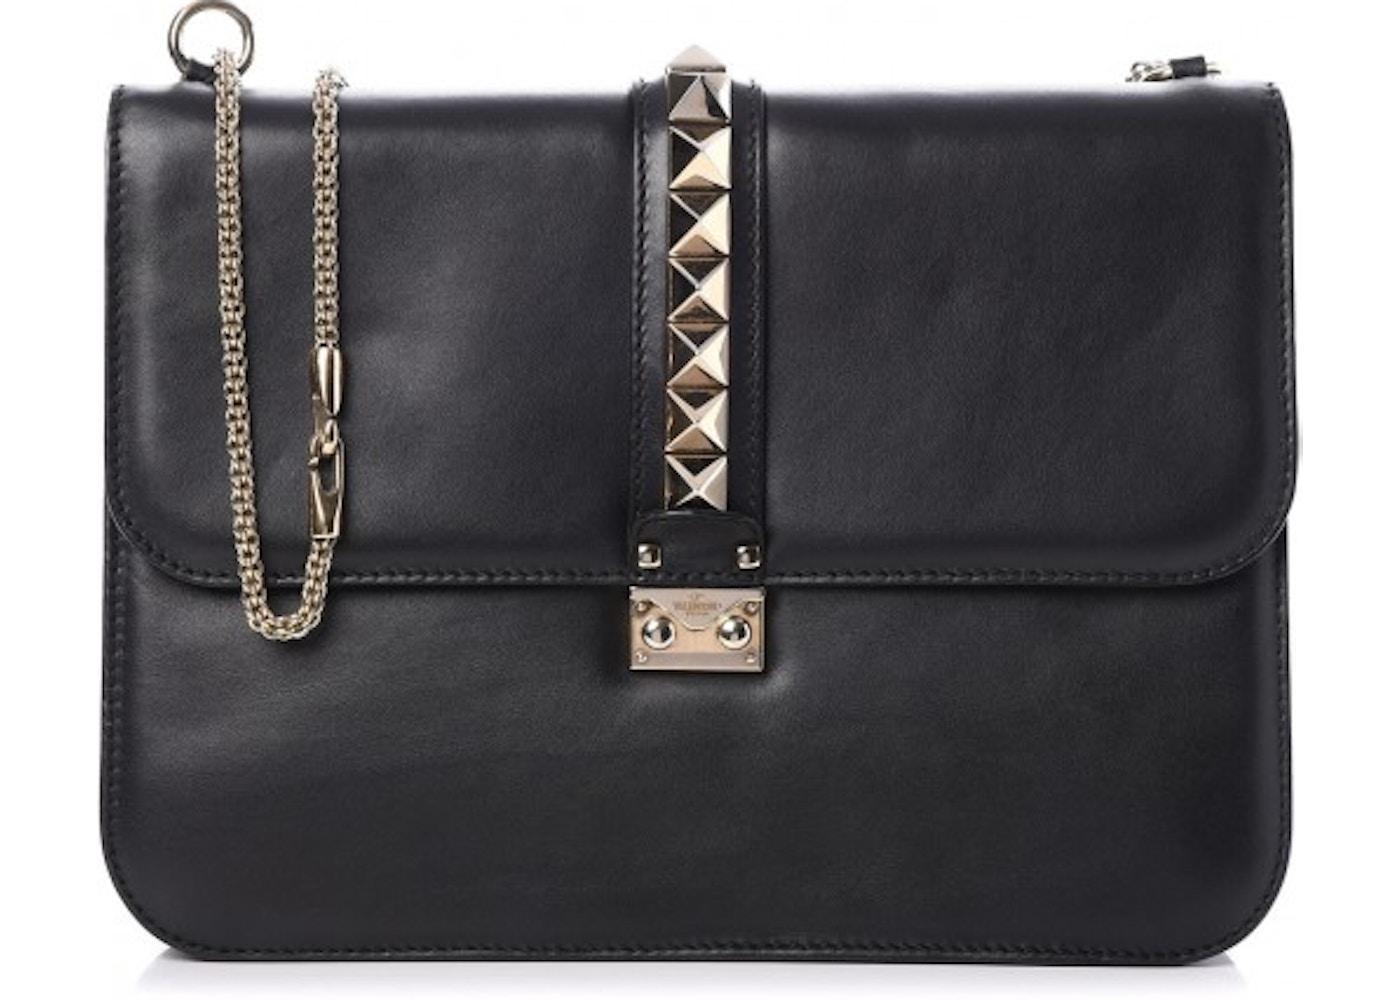 a88708773d0c Valentino Glam Lock Rockstud Flap Large Black. Large Black